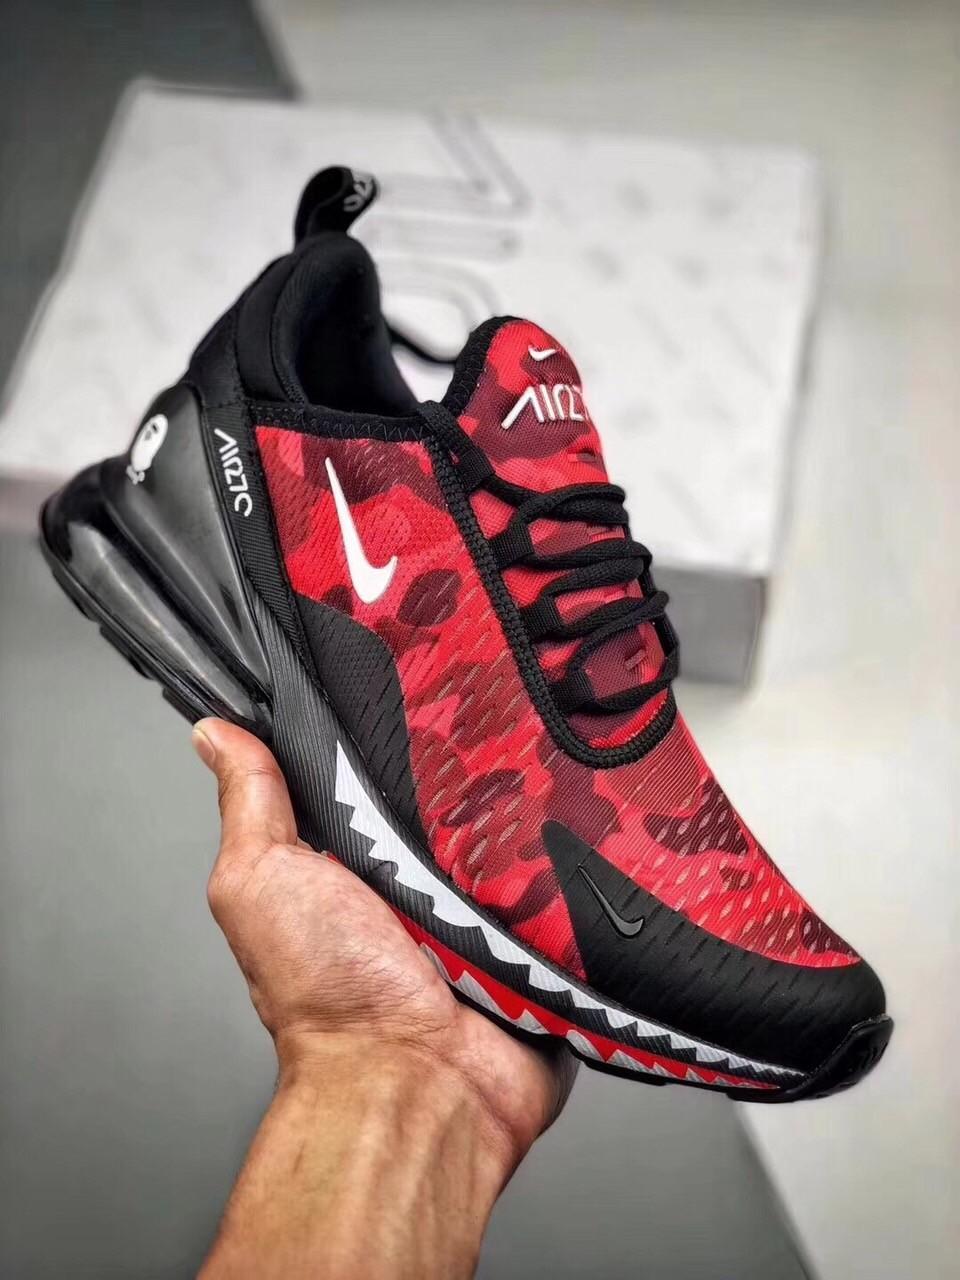 de46a85a8a Replica A Bathing APE X Nike Air Max270 Red Military Jogging Shoes